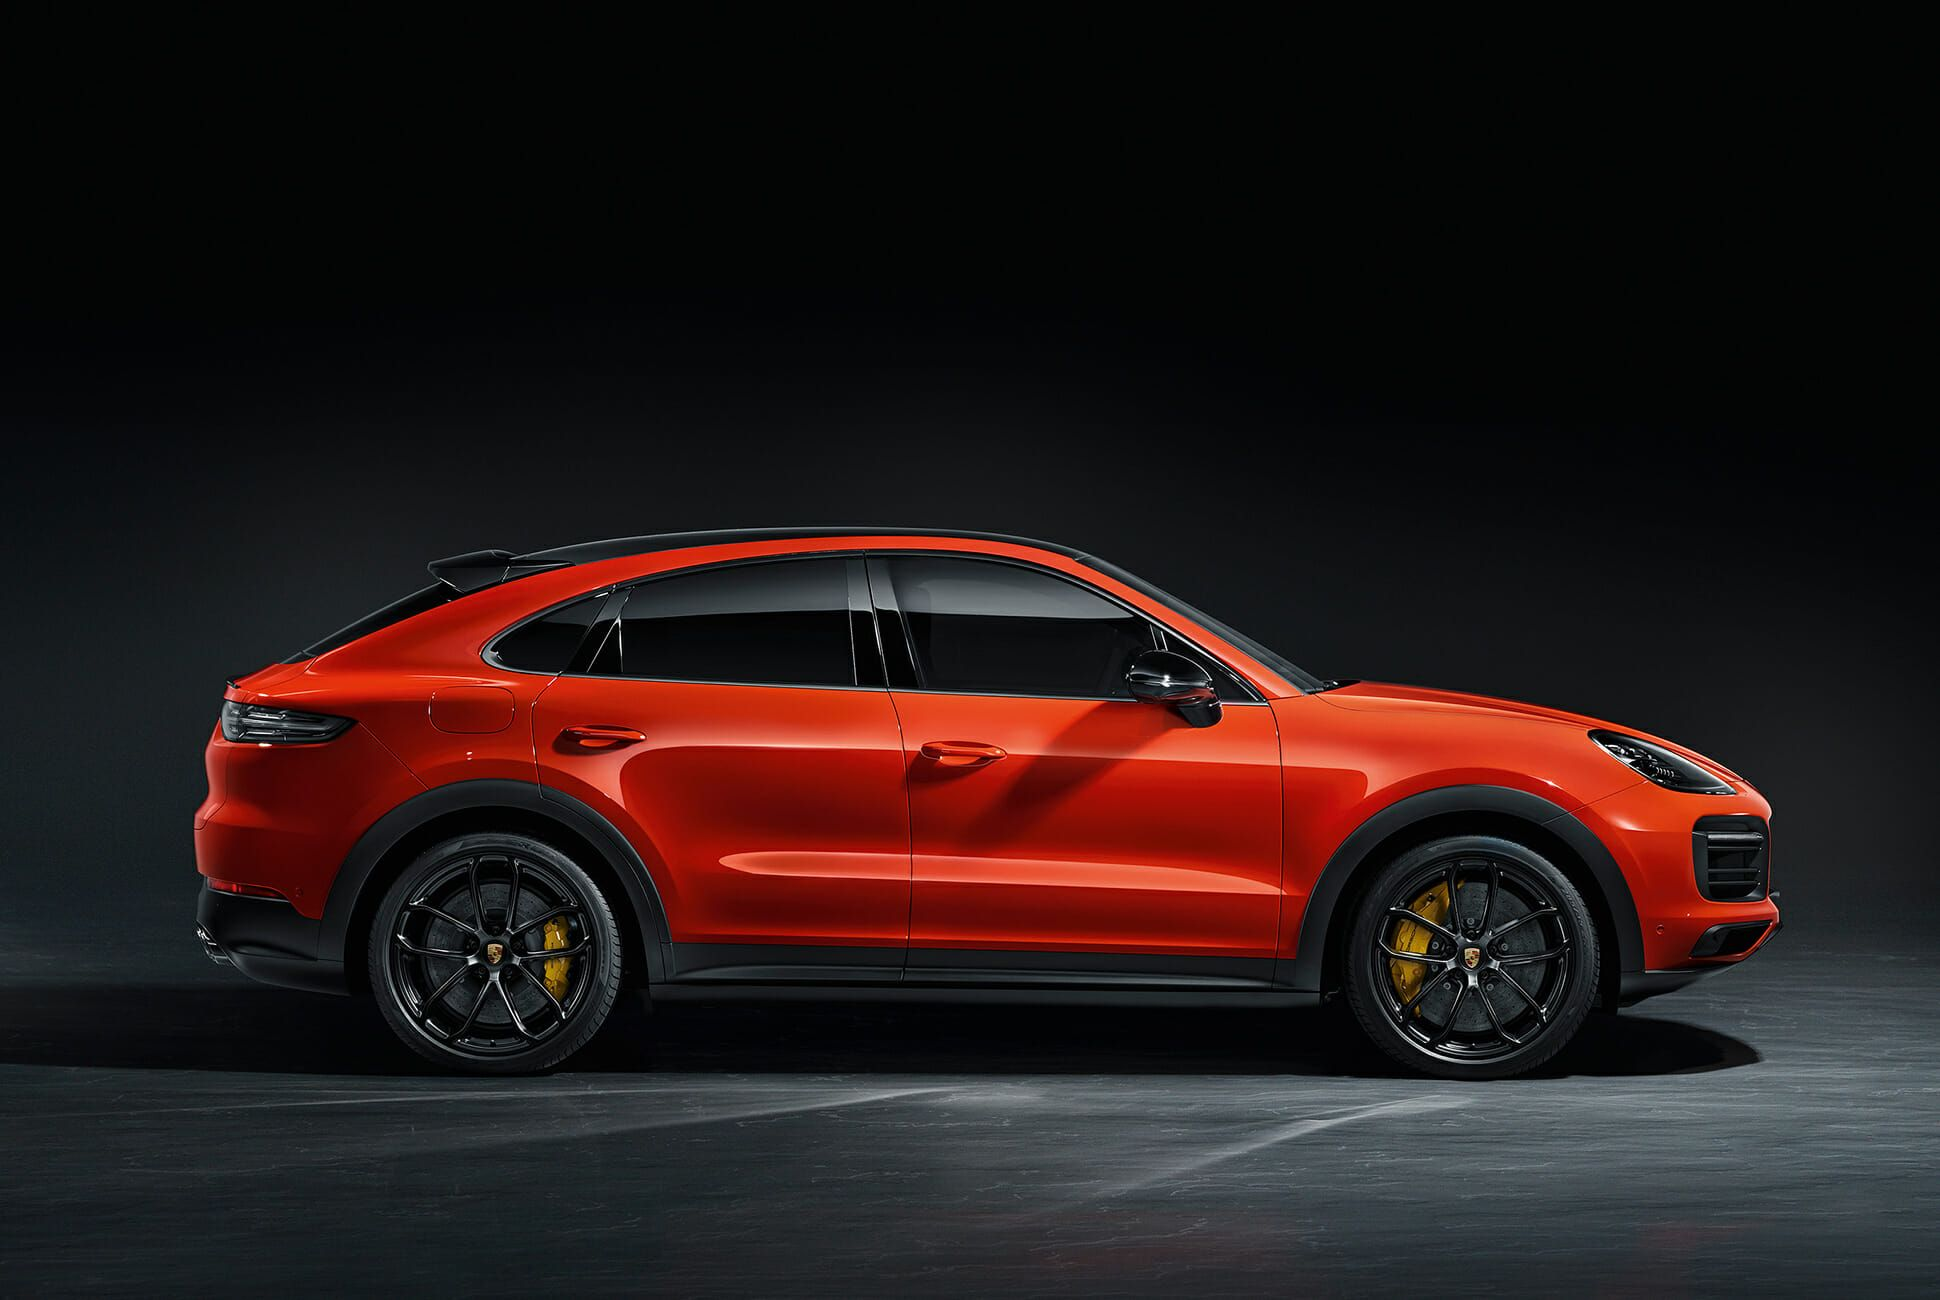 2020-Porsche-Cayenne-Coupe-gear-patrol-slide-3